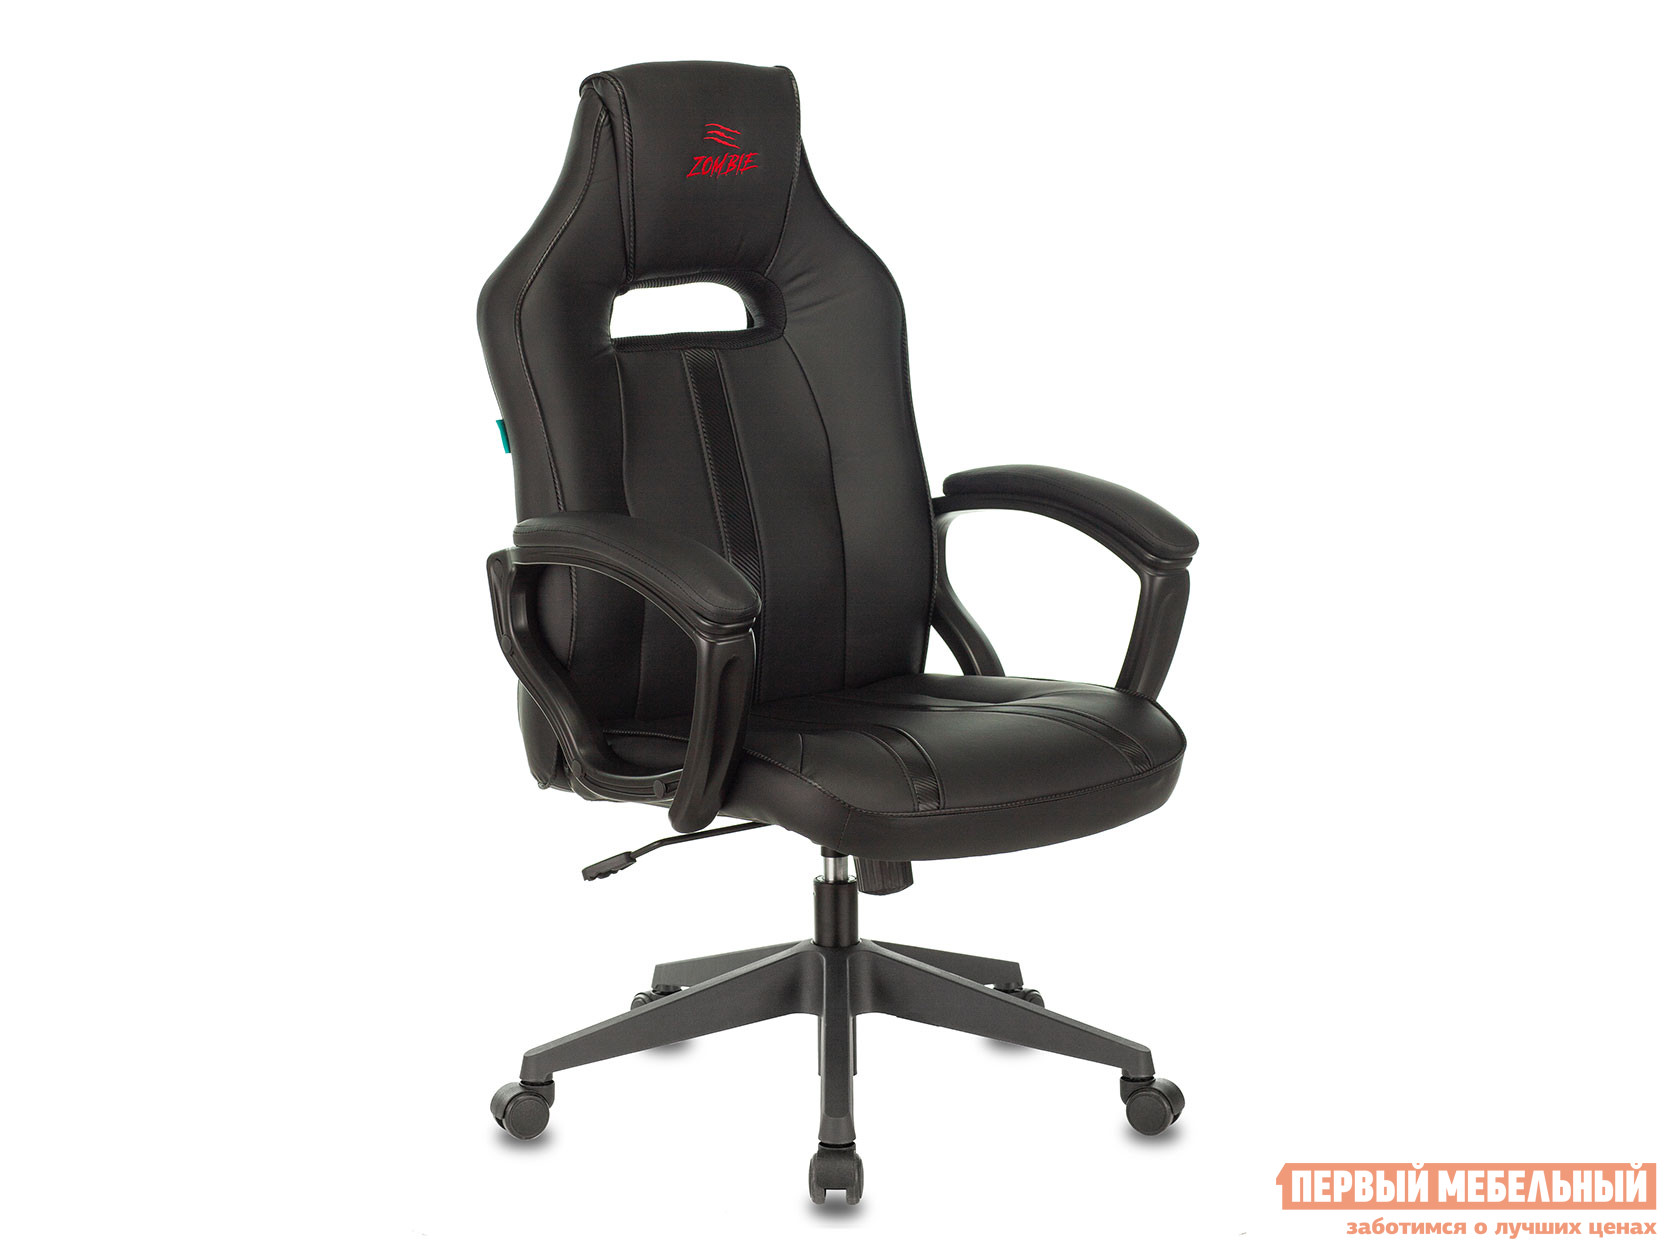 Игровое кресло Бюрократ Кресло игровое Бюрократ VIKING ZOMBIE A3 кресло игровое dxracer dxracer drifting oh dj133 n